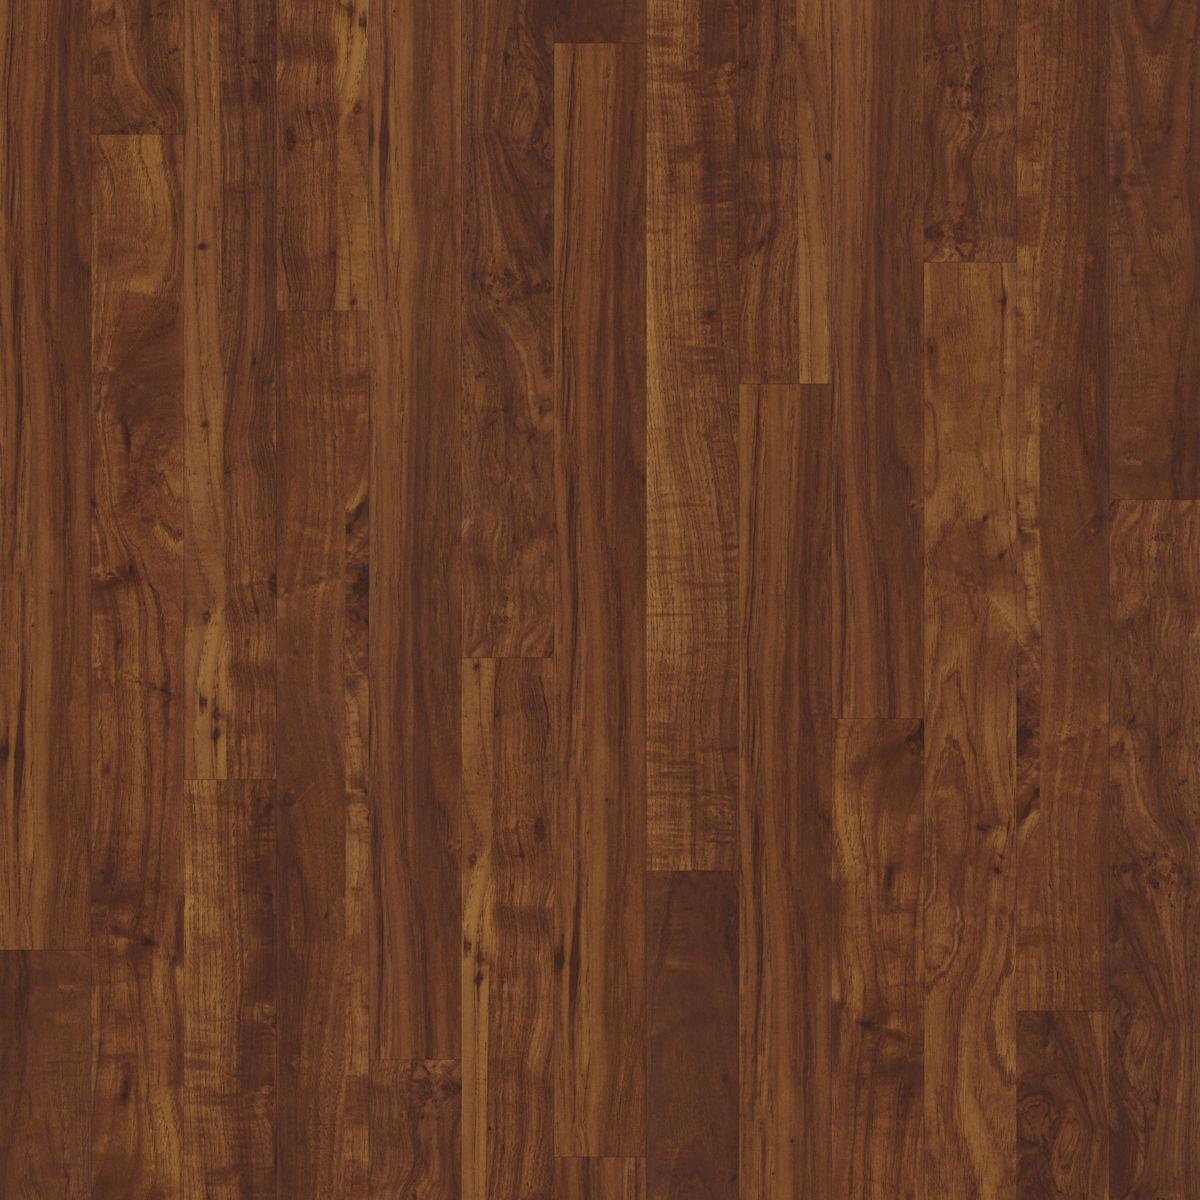 Karndean Da Vinci Australian Walnut Rp41 Vinyl Flooring